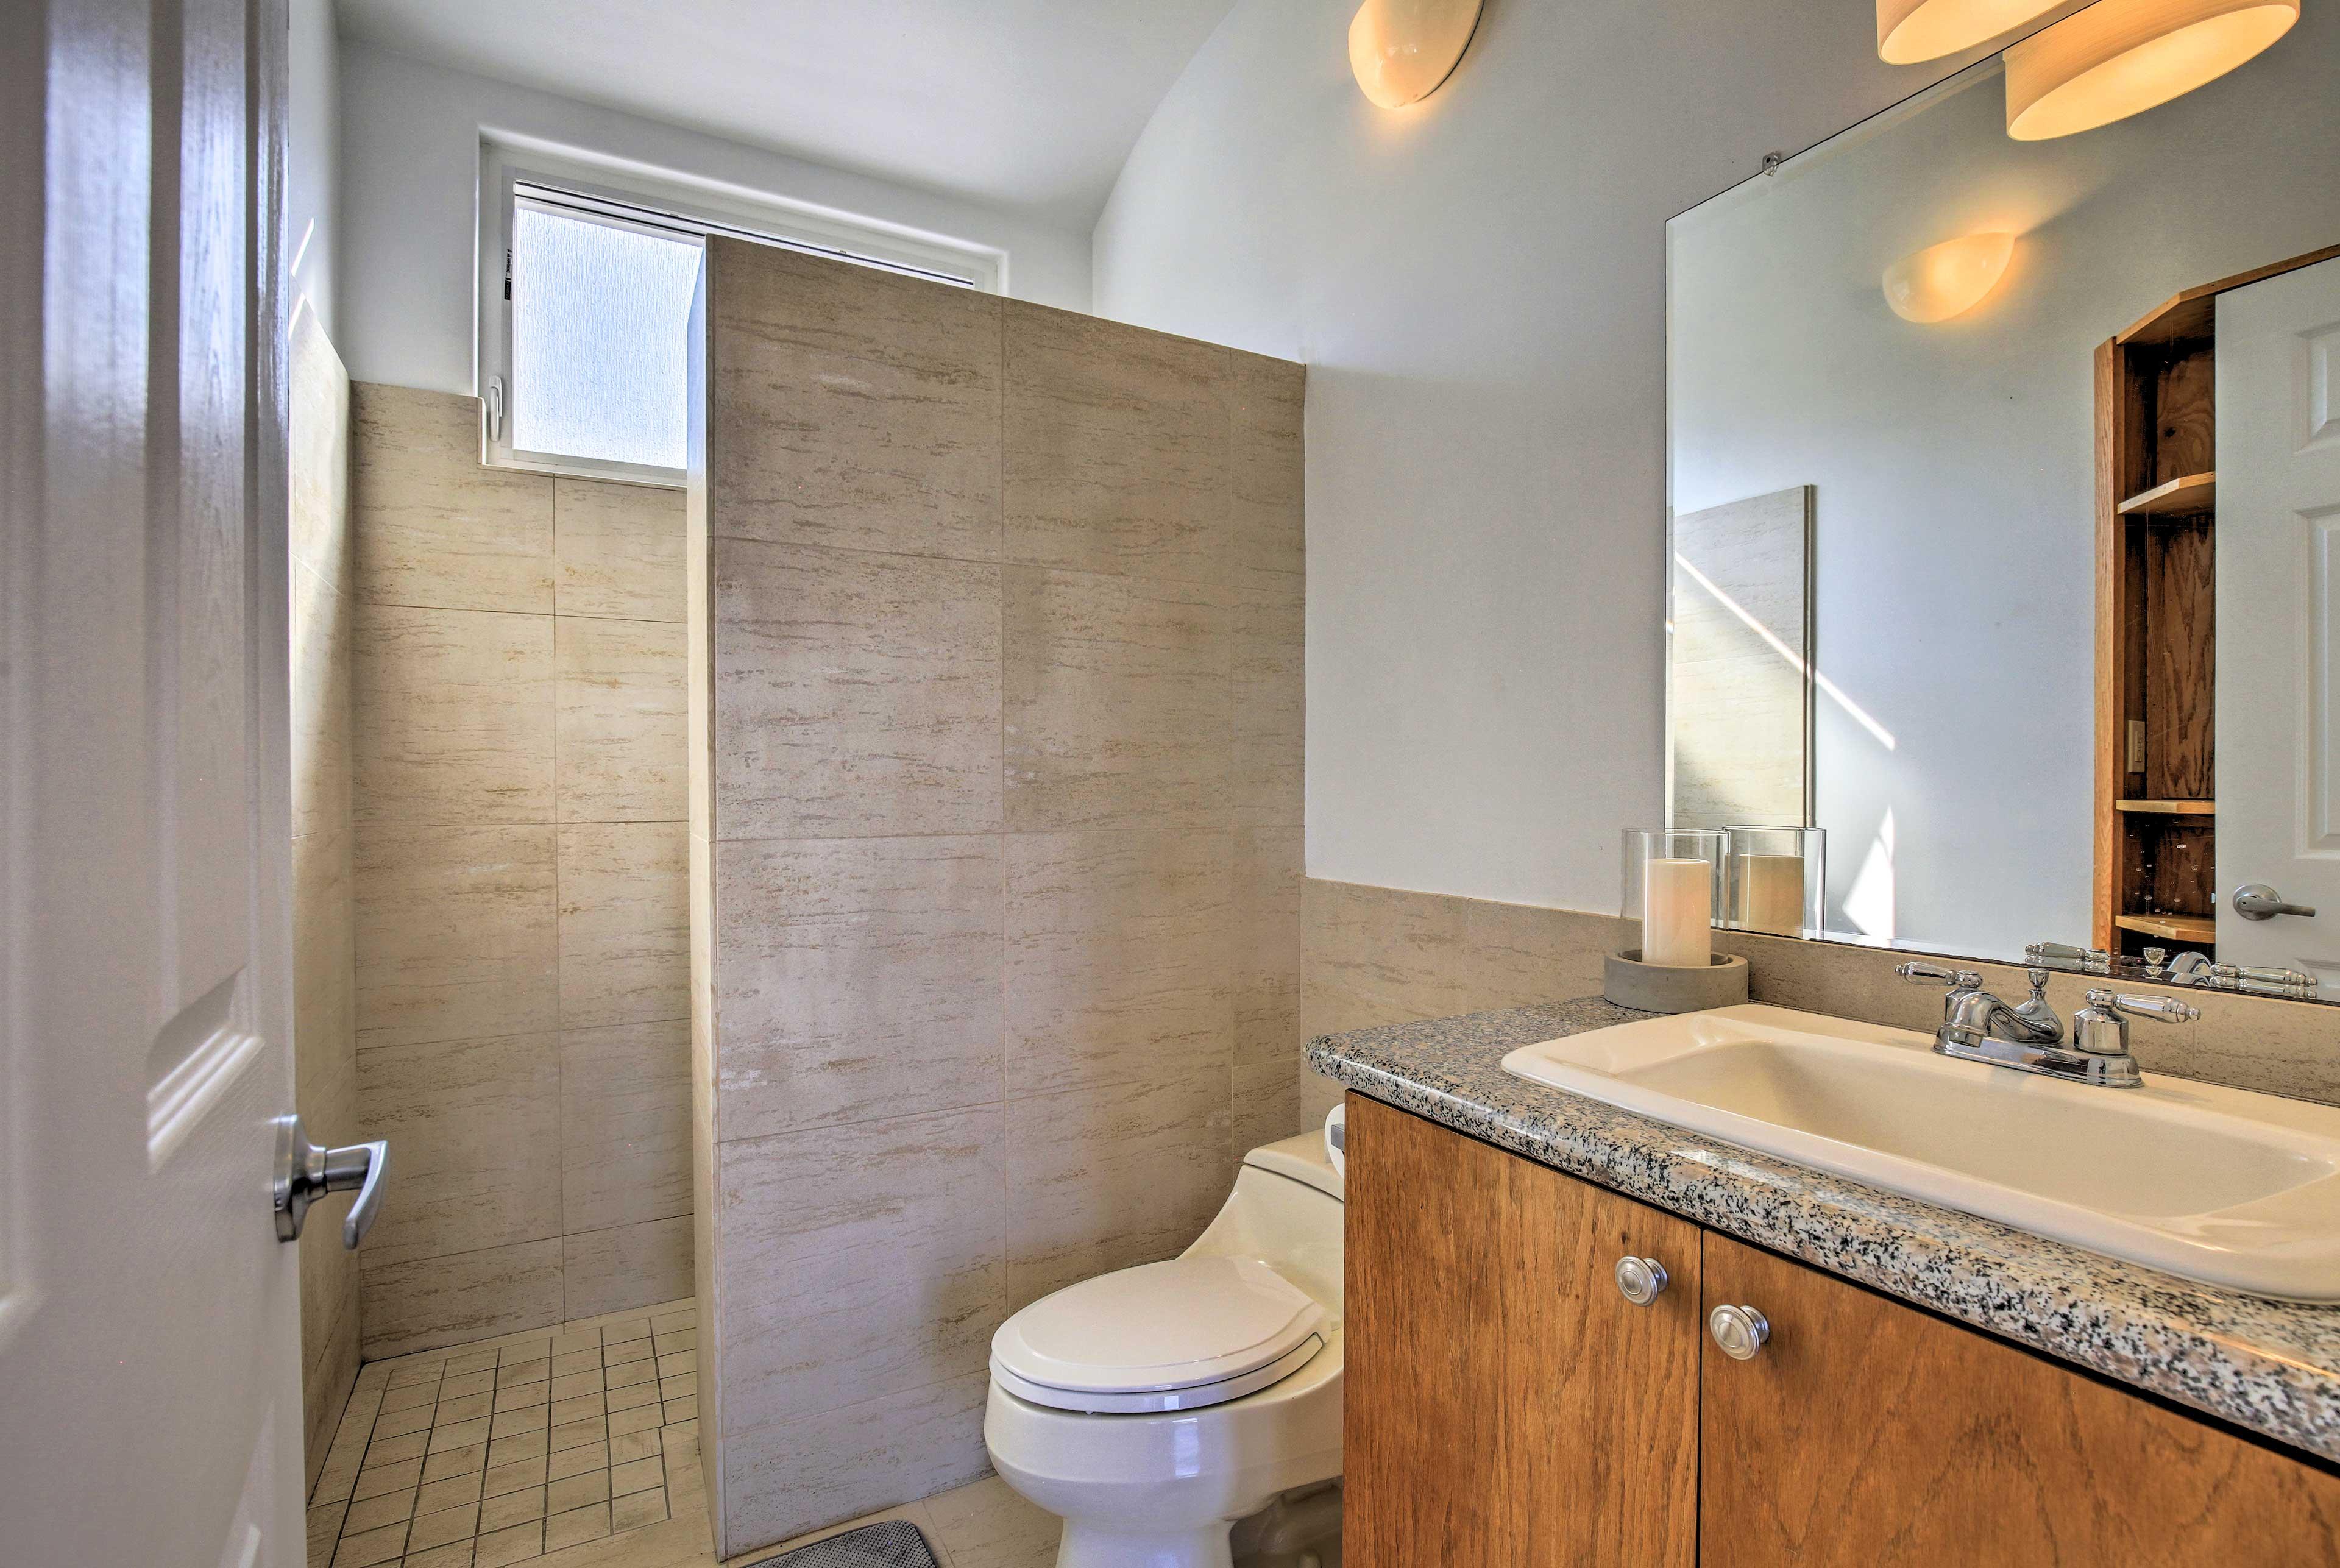 Wash up in the bathroom's single vanity before dinnertime.